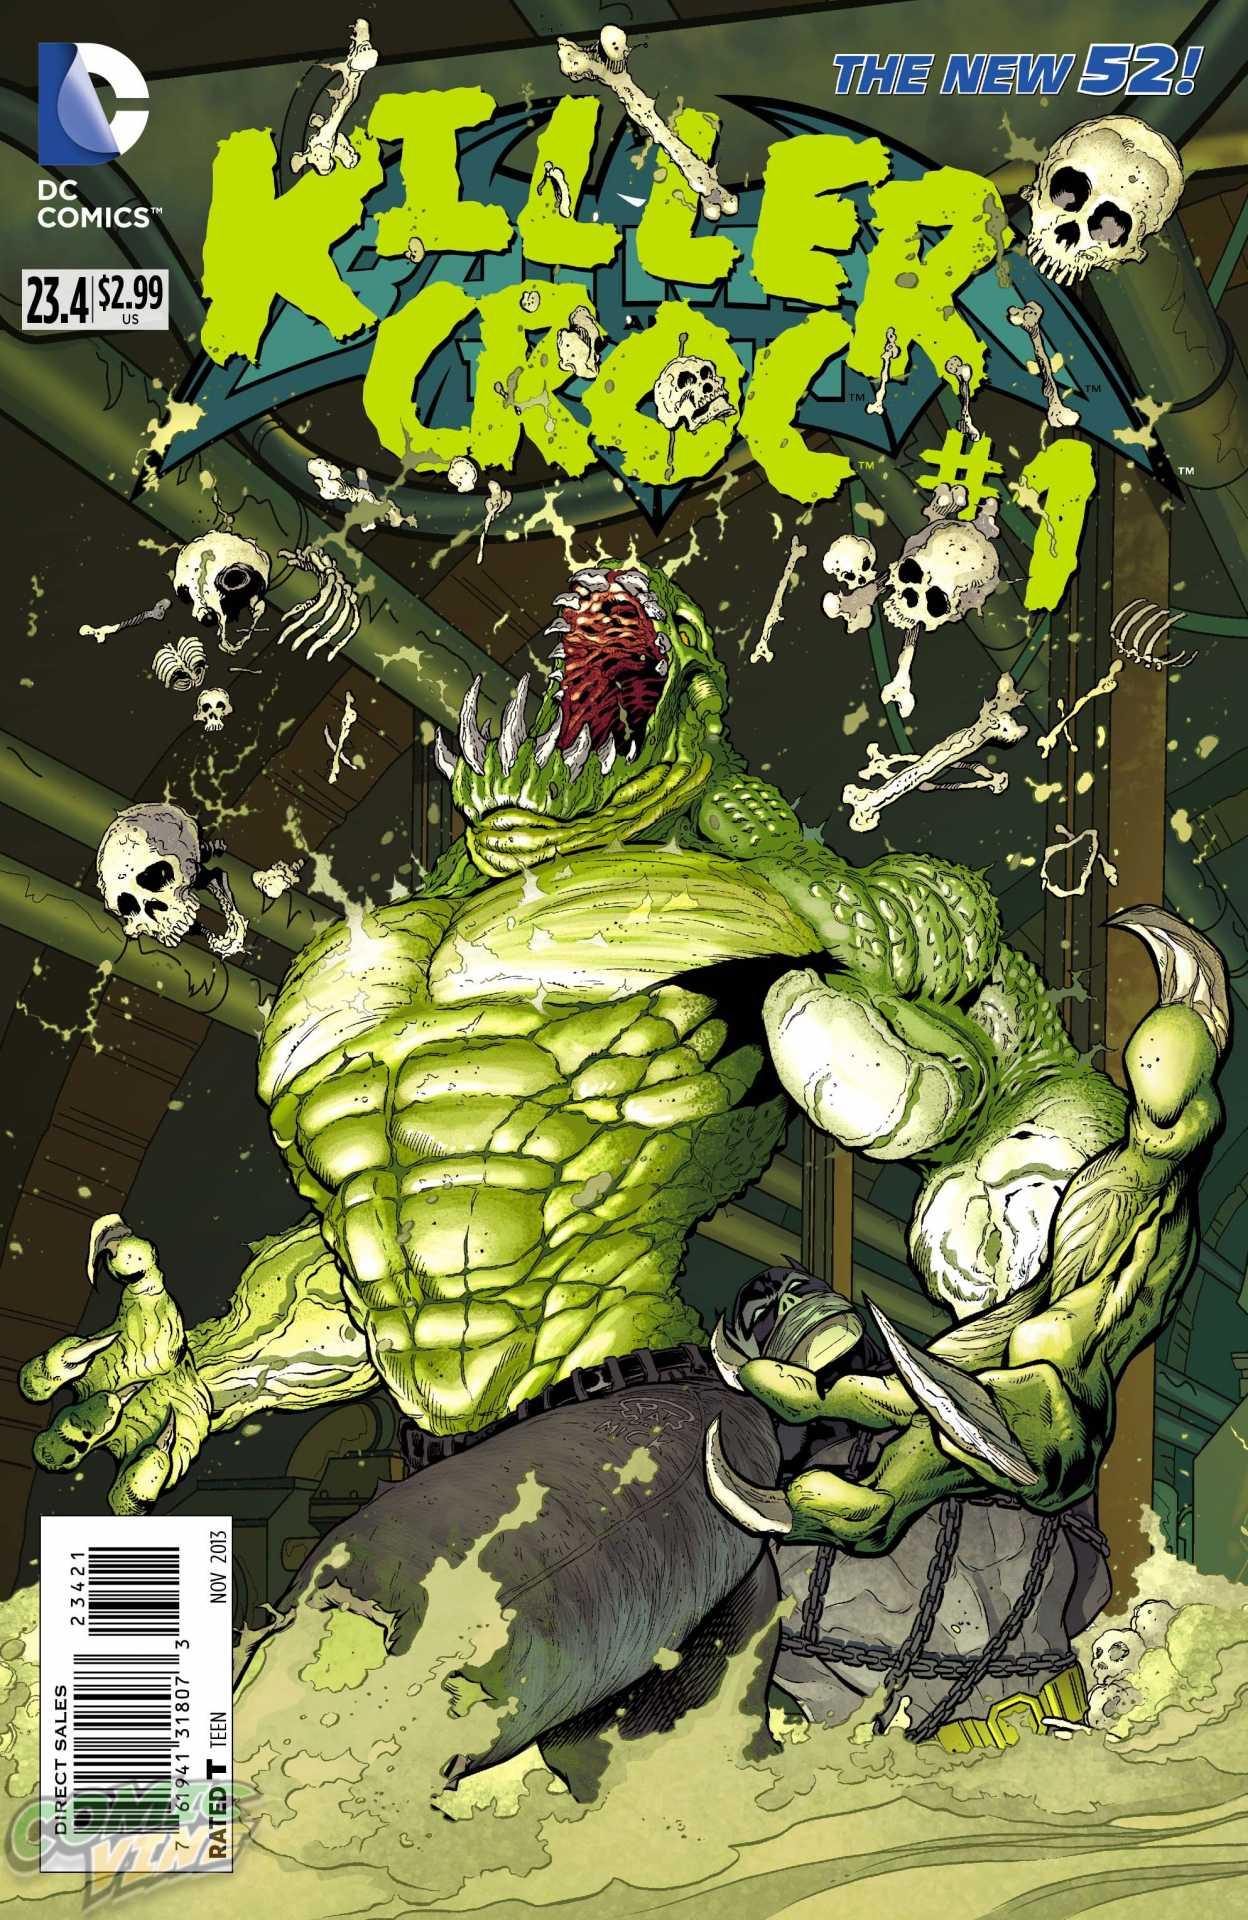 BATMAN AND ROBIN #23.4: KILLER CROC